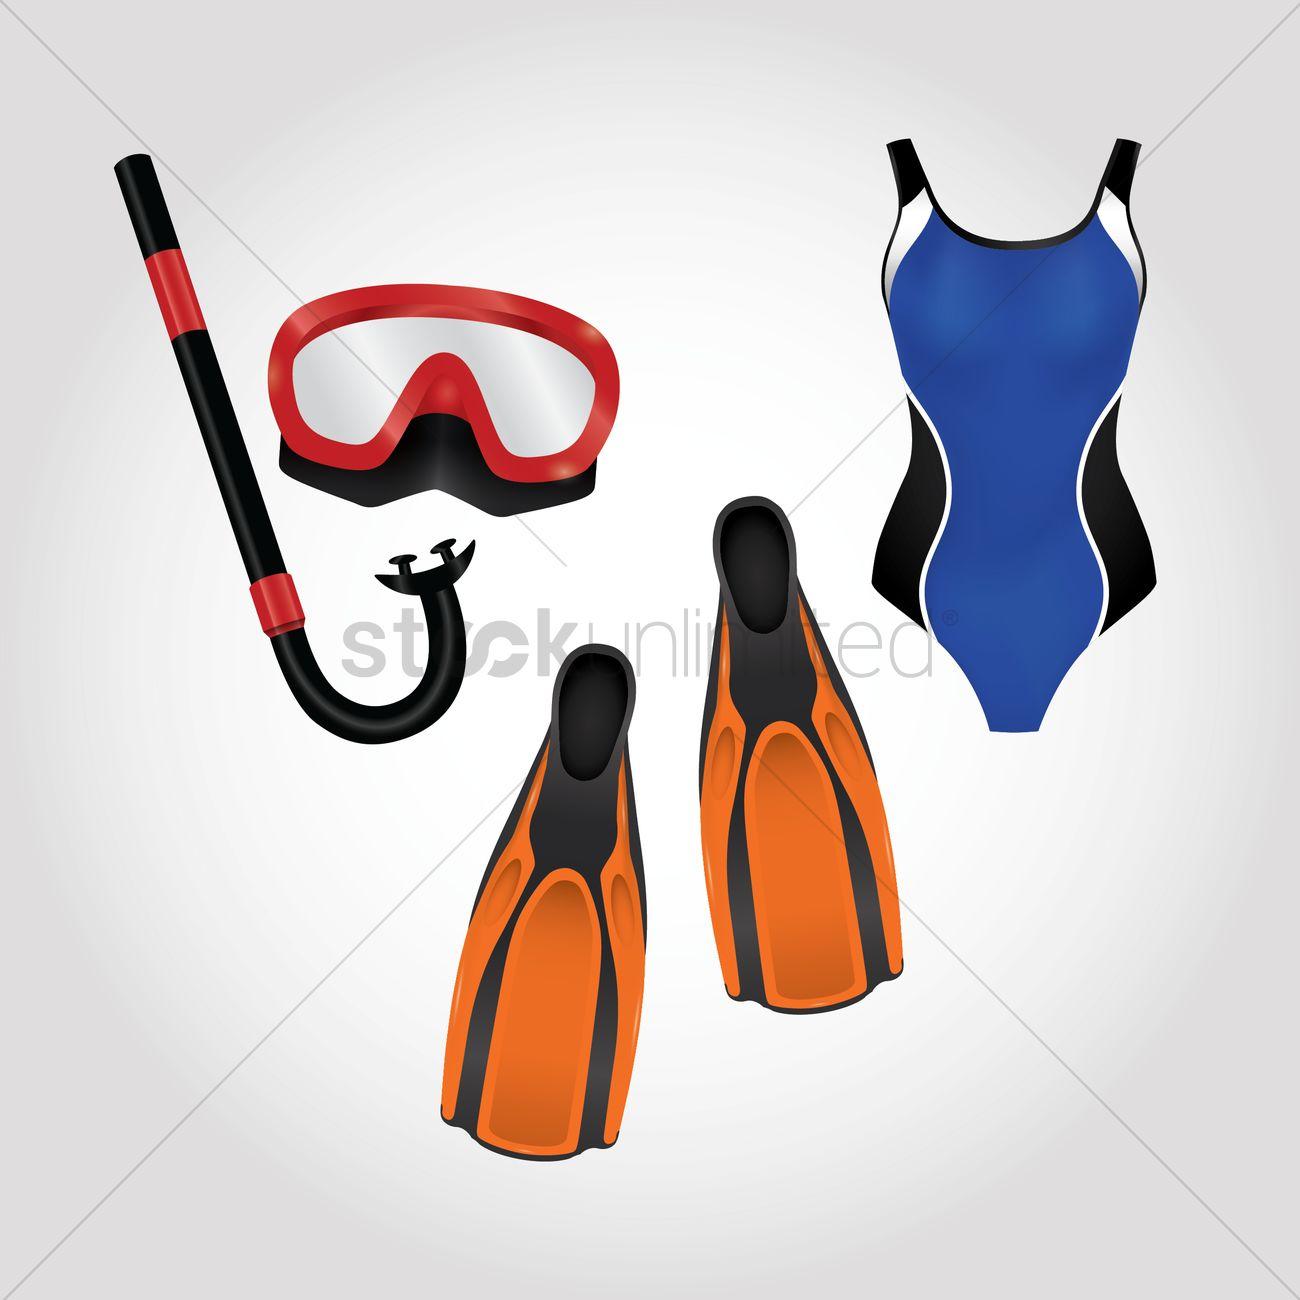 2db07f2b6f6 Swimming equipments Vector Image - 1513045 | StockUnlimited